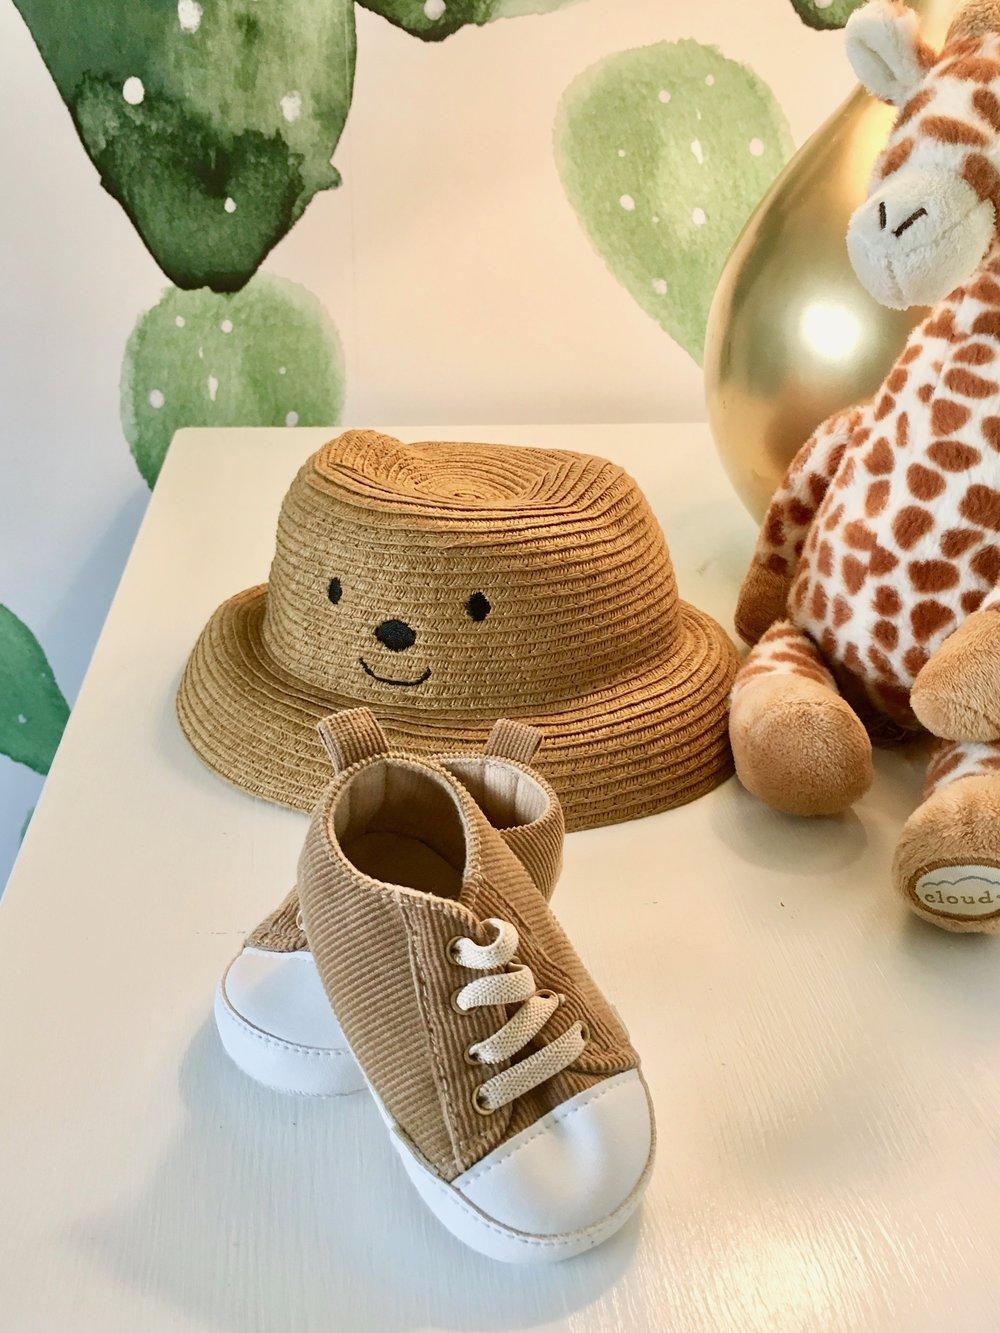 cactus-babyshoes-crop.jpg